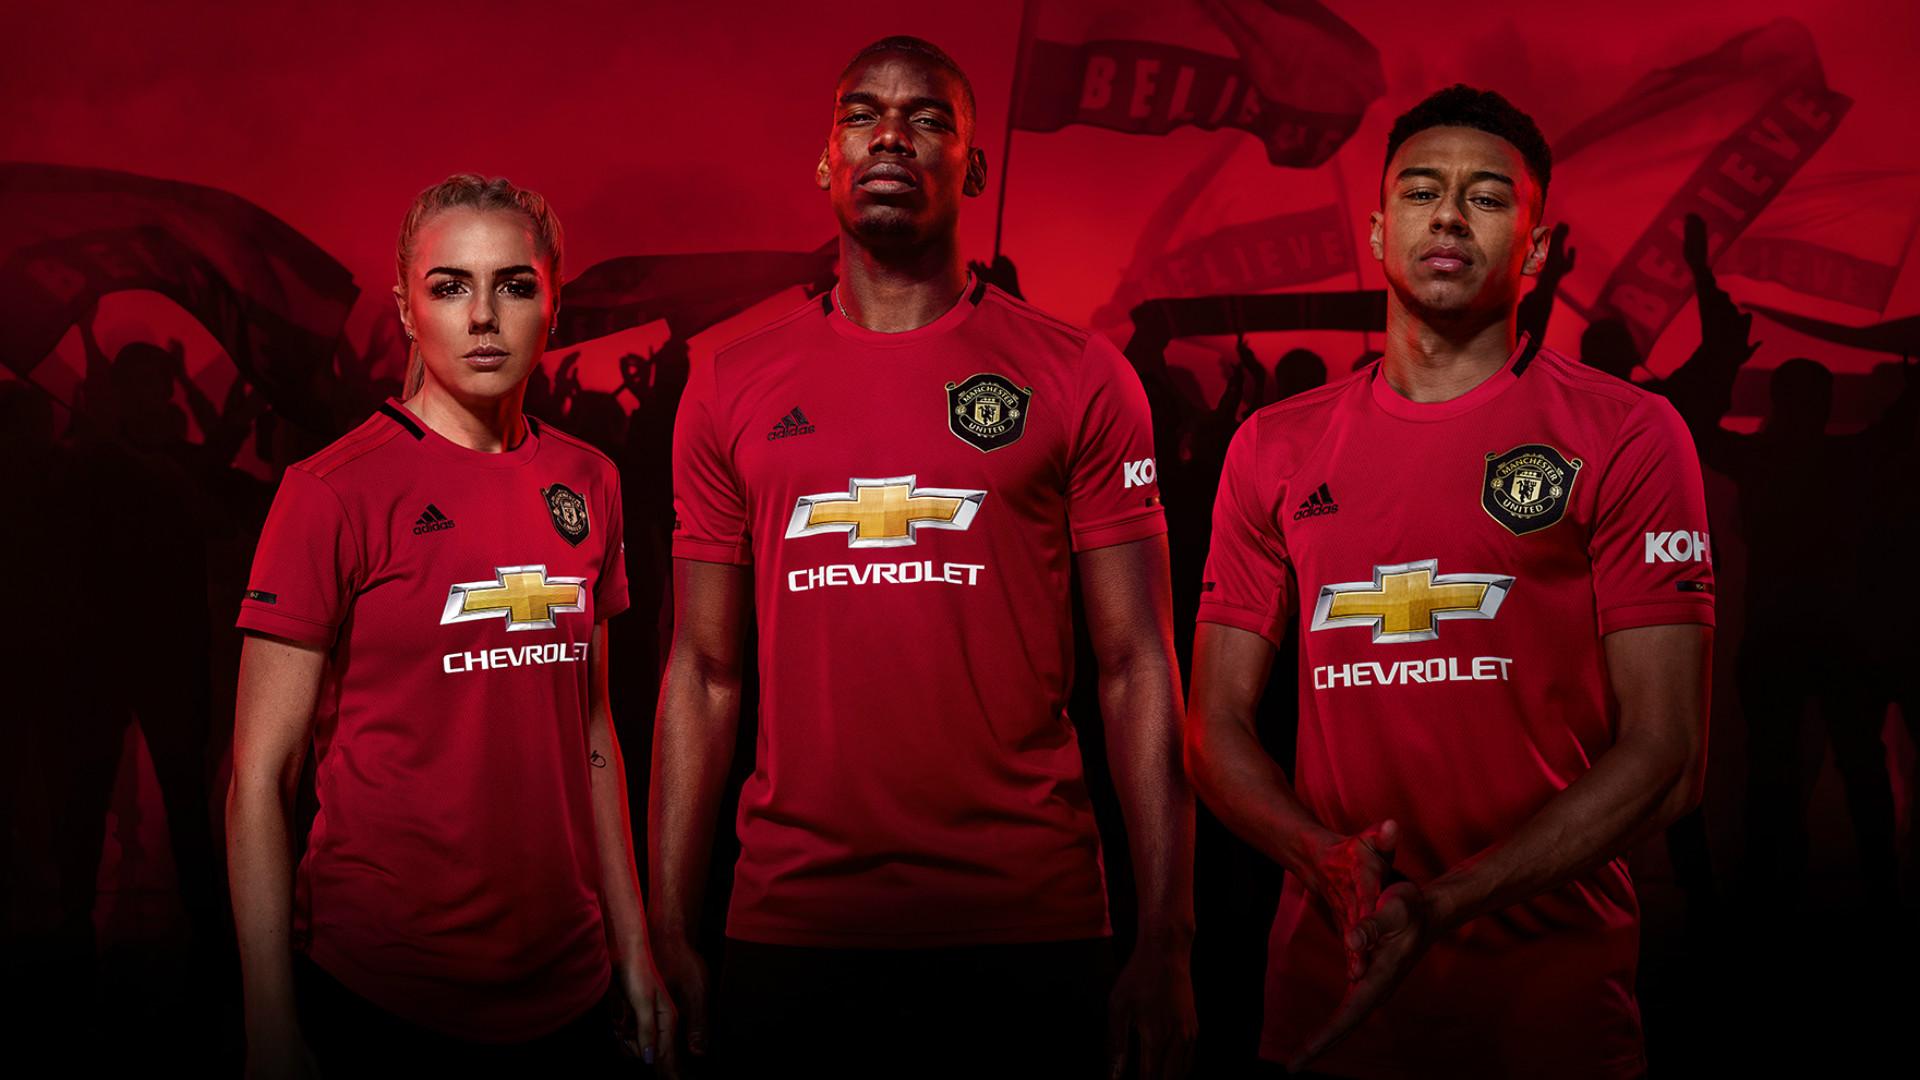 New 2019 20 football kits: Real Madrid, Manchester United